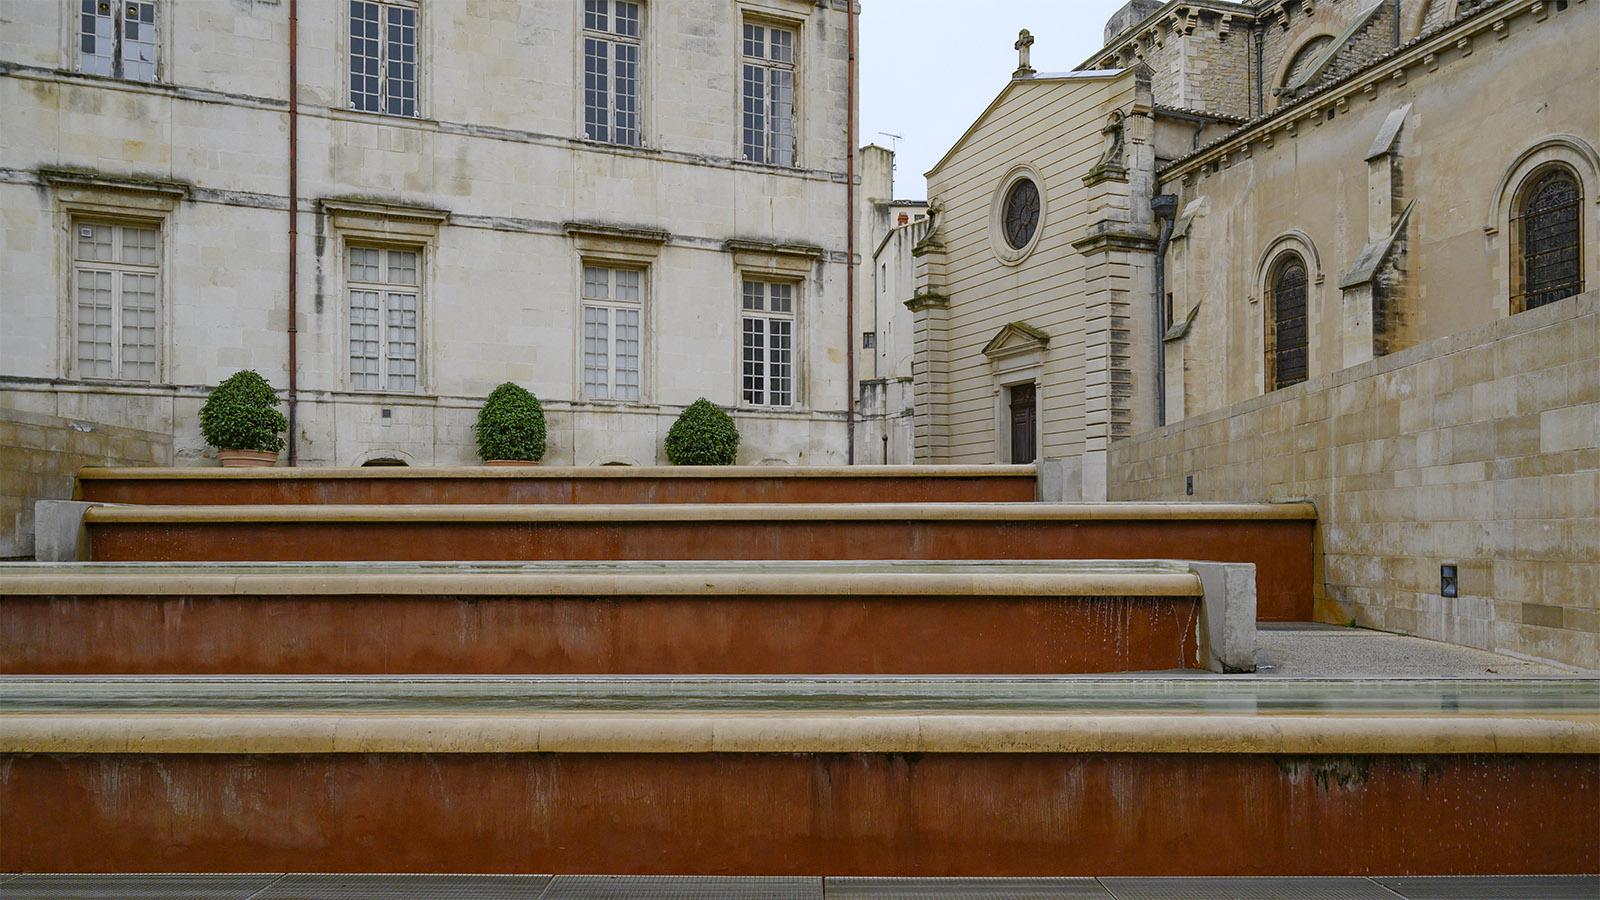 Der Treppenbrunnen der Place du Chapitre. Im Sommer fließt Wasser über die Stufen. Foto: Hilke Maunder